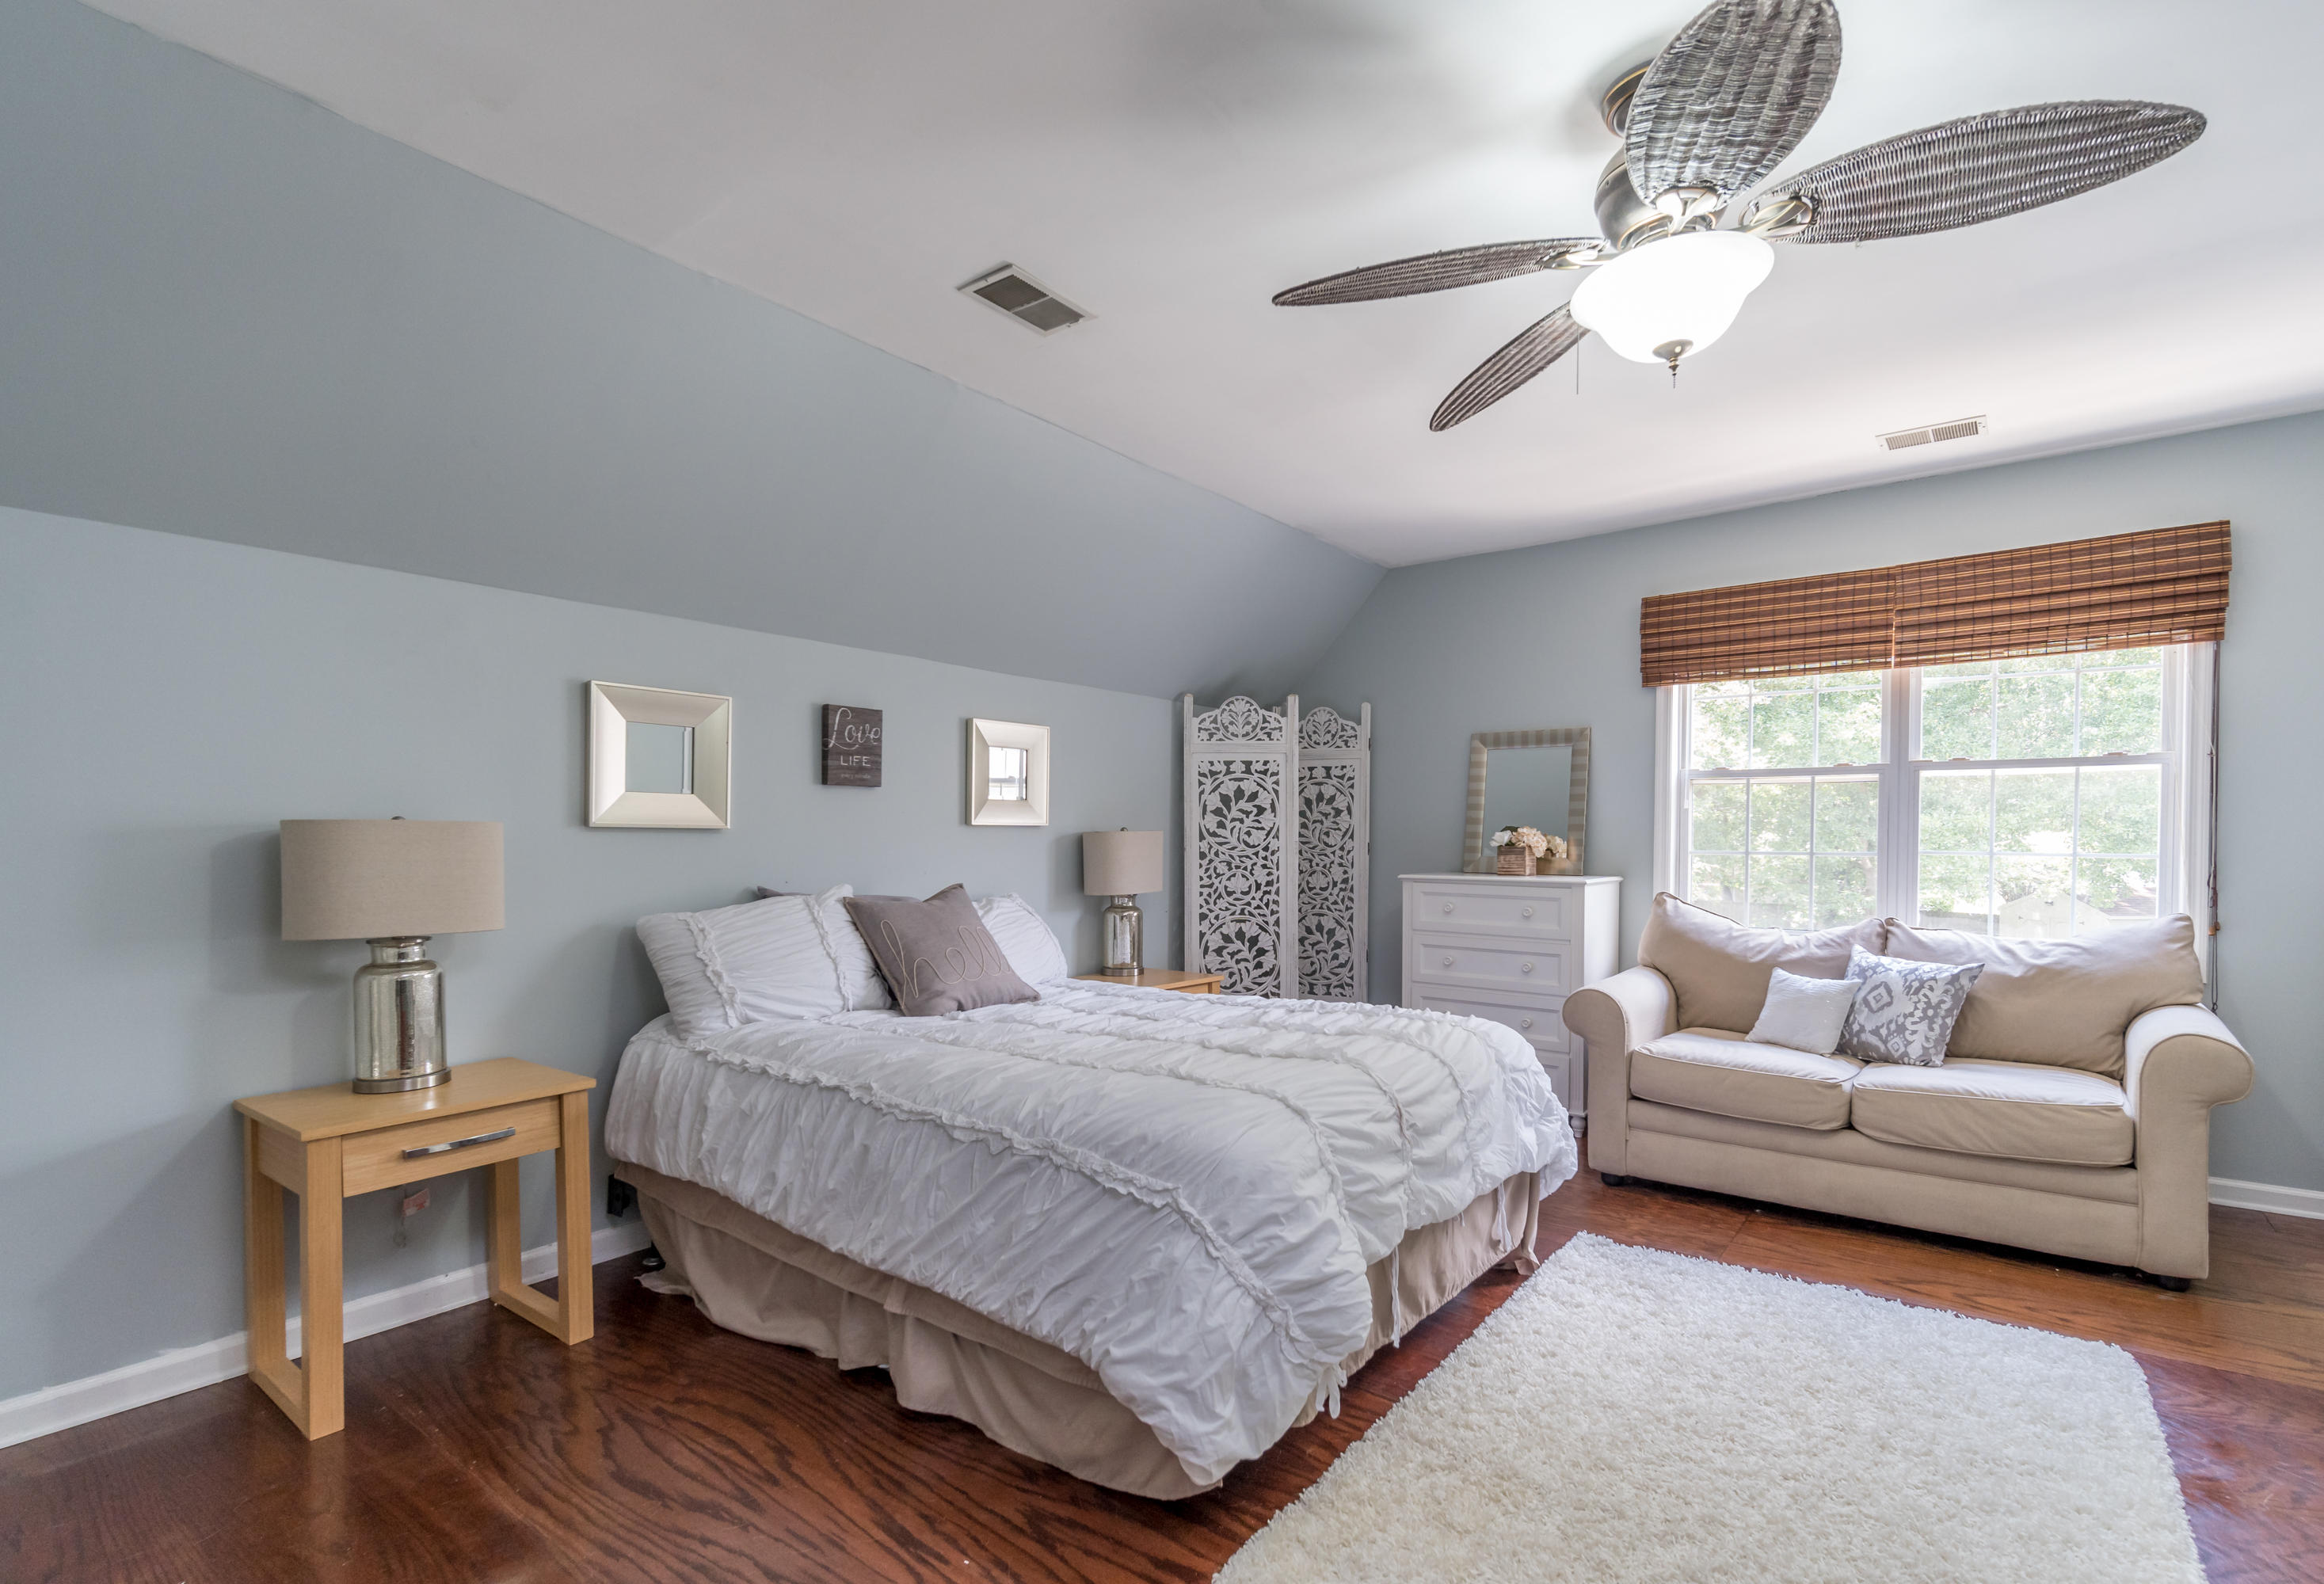 Northwoods Estates Homes For Sale - 8128 Sardis, North Charleston, SC - 11